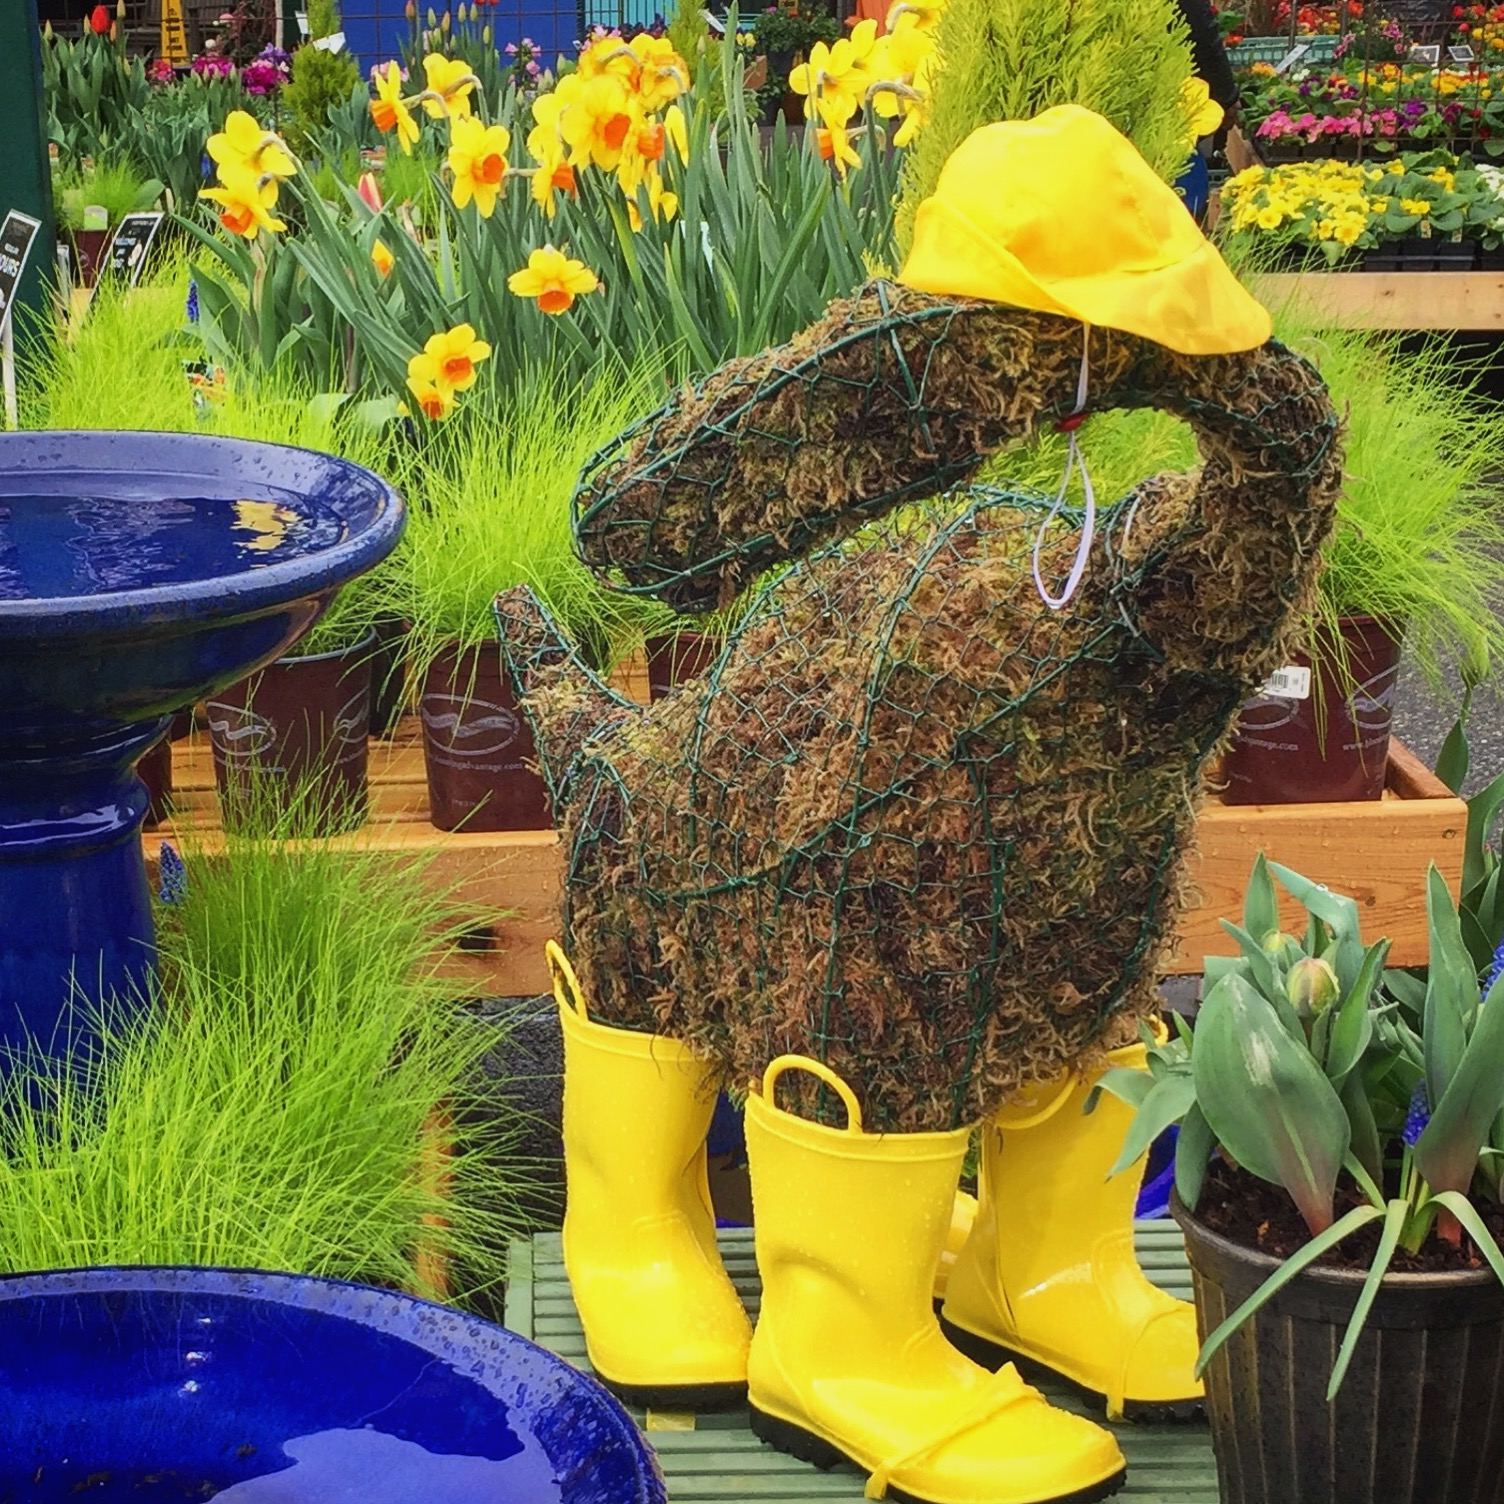 Beatrice the dinosaur in her rain gear